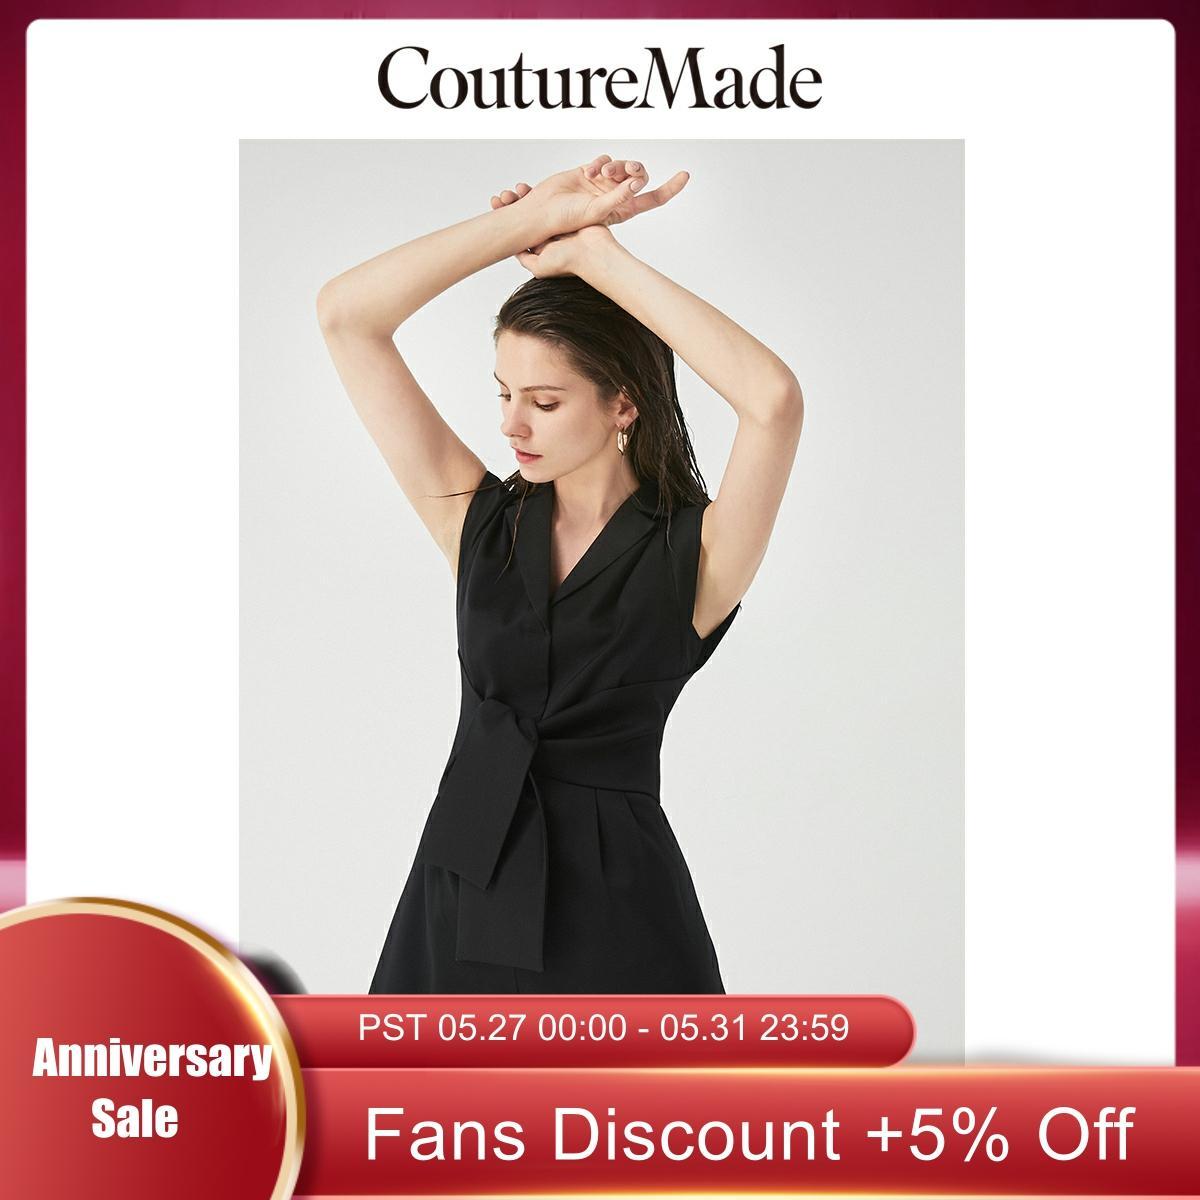 Vero Moda CoutureMade Women's 96% Mulberry Silk Jumpsuit | 319378514